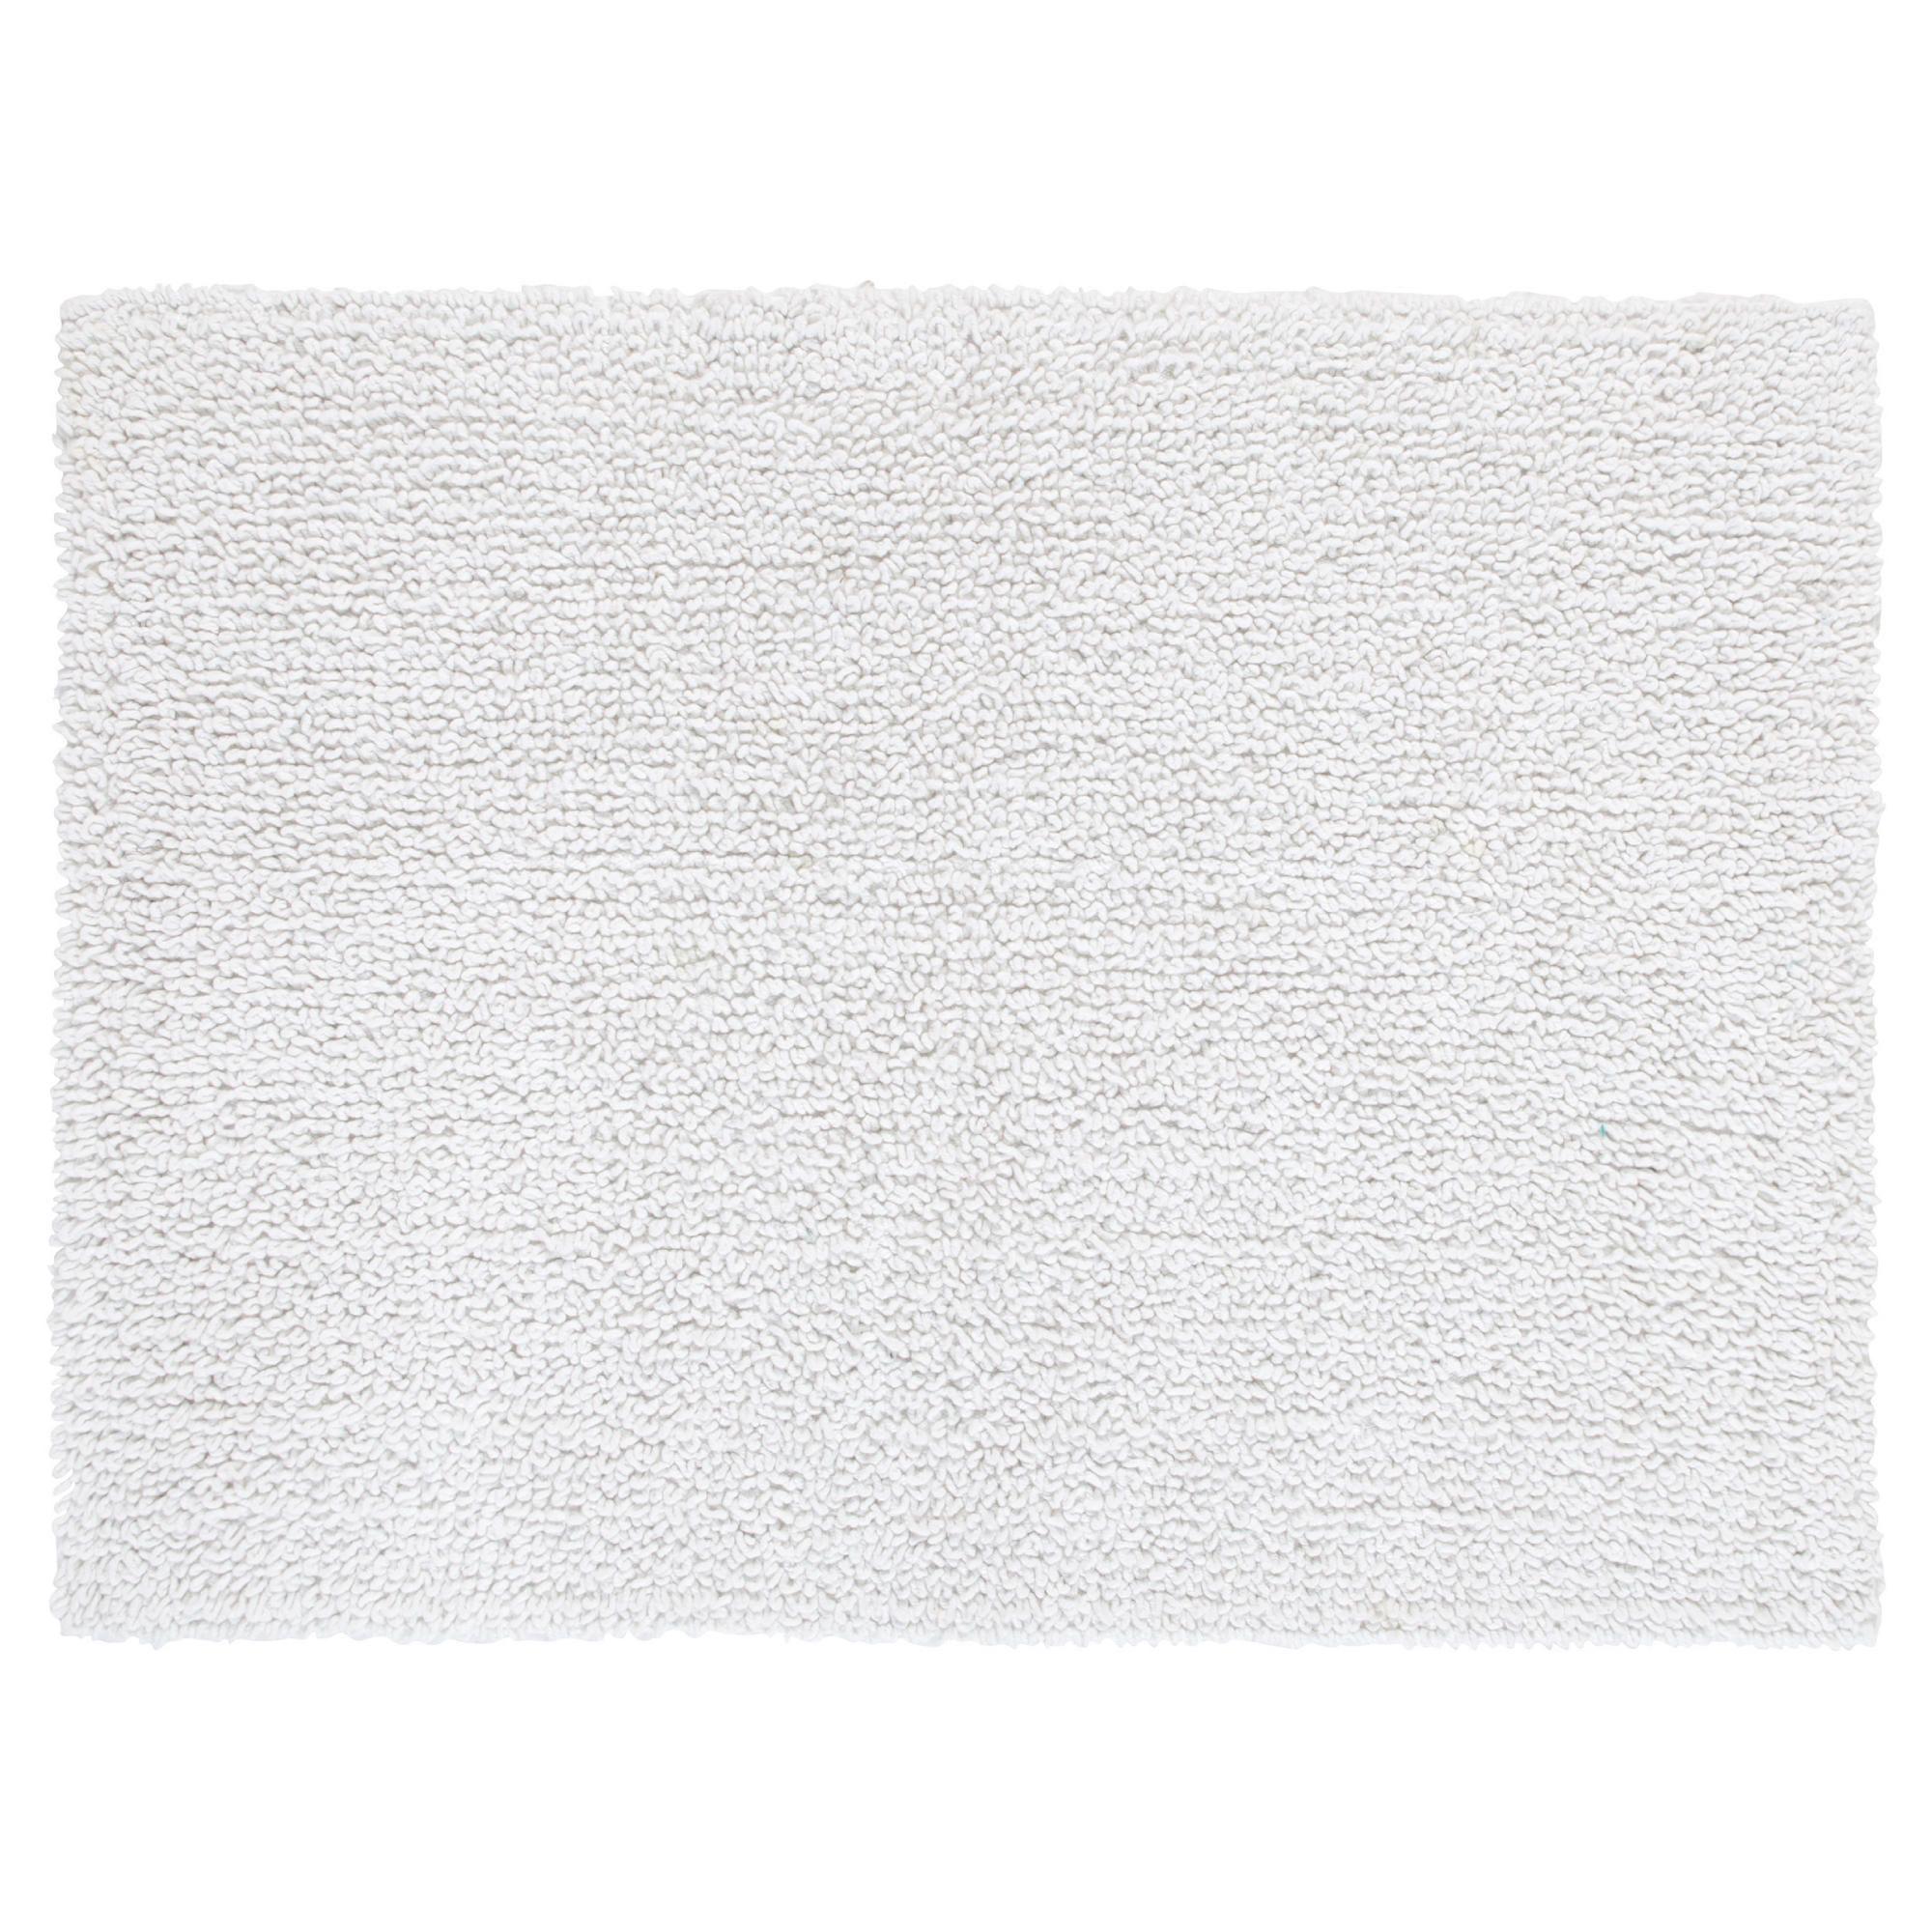 tesco direct tesco standard reversible bath mat white. Black Bedroom Furniture Sets. Home Design Ideas